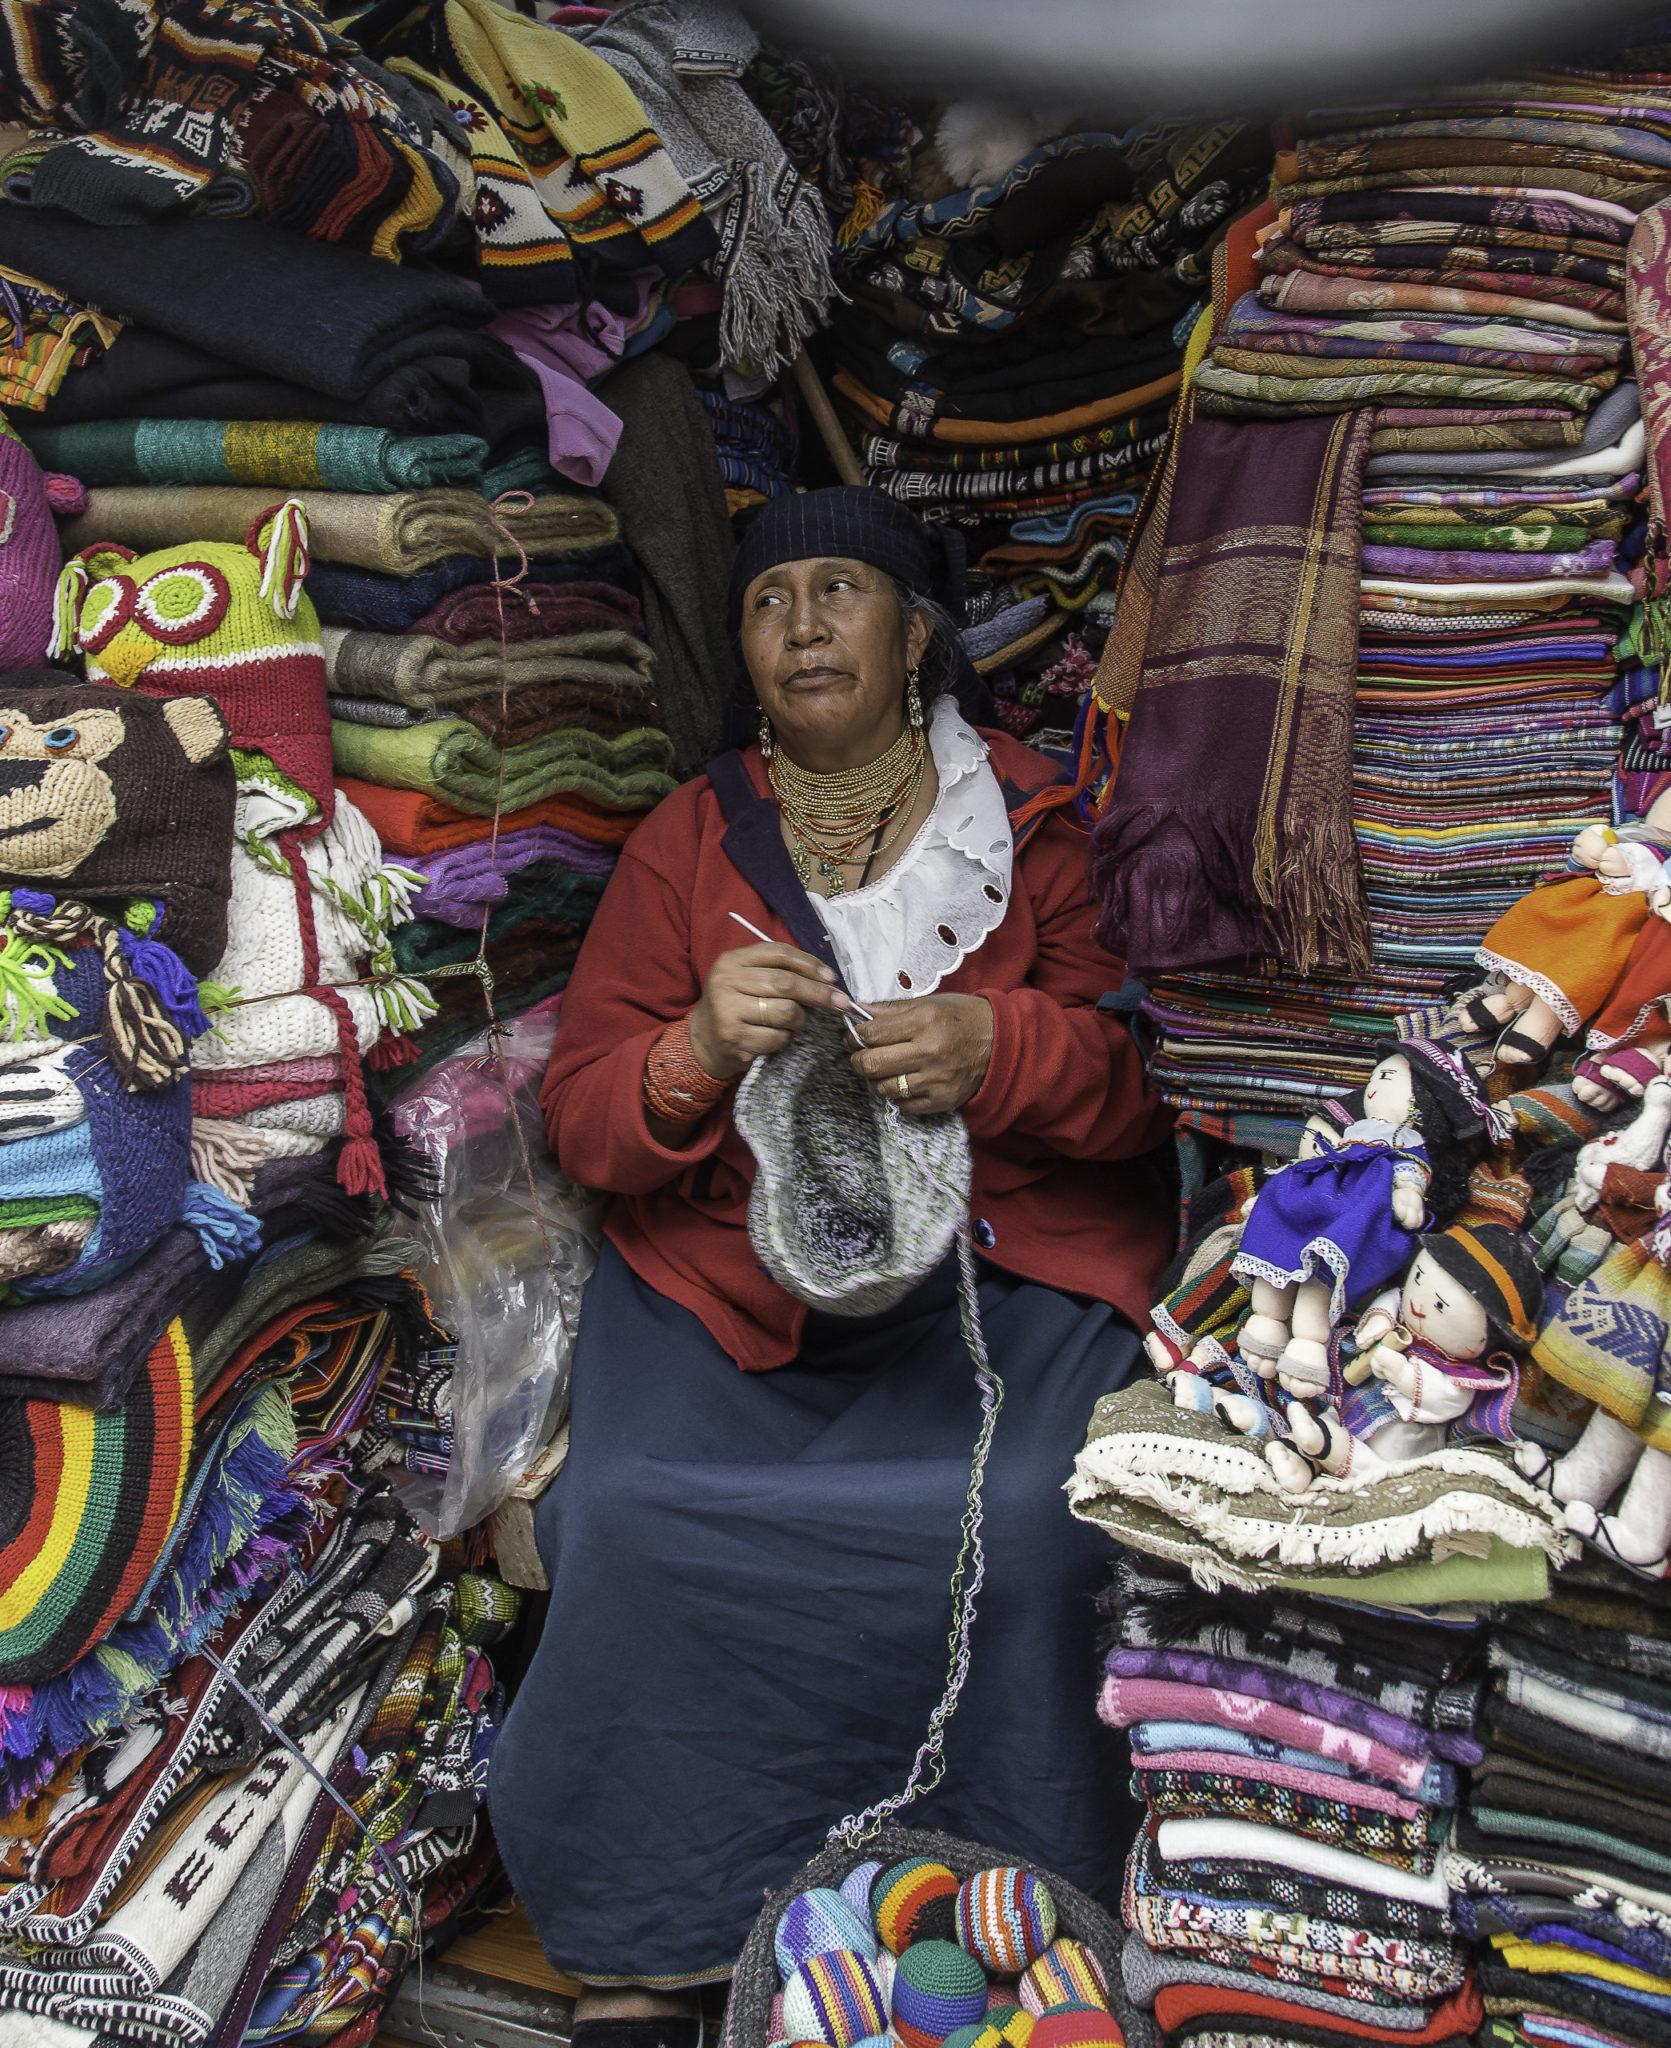 Markt in Quito